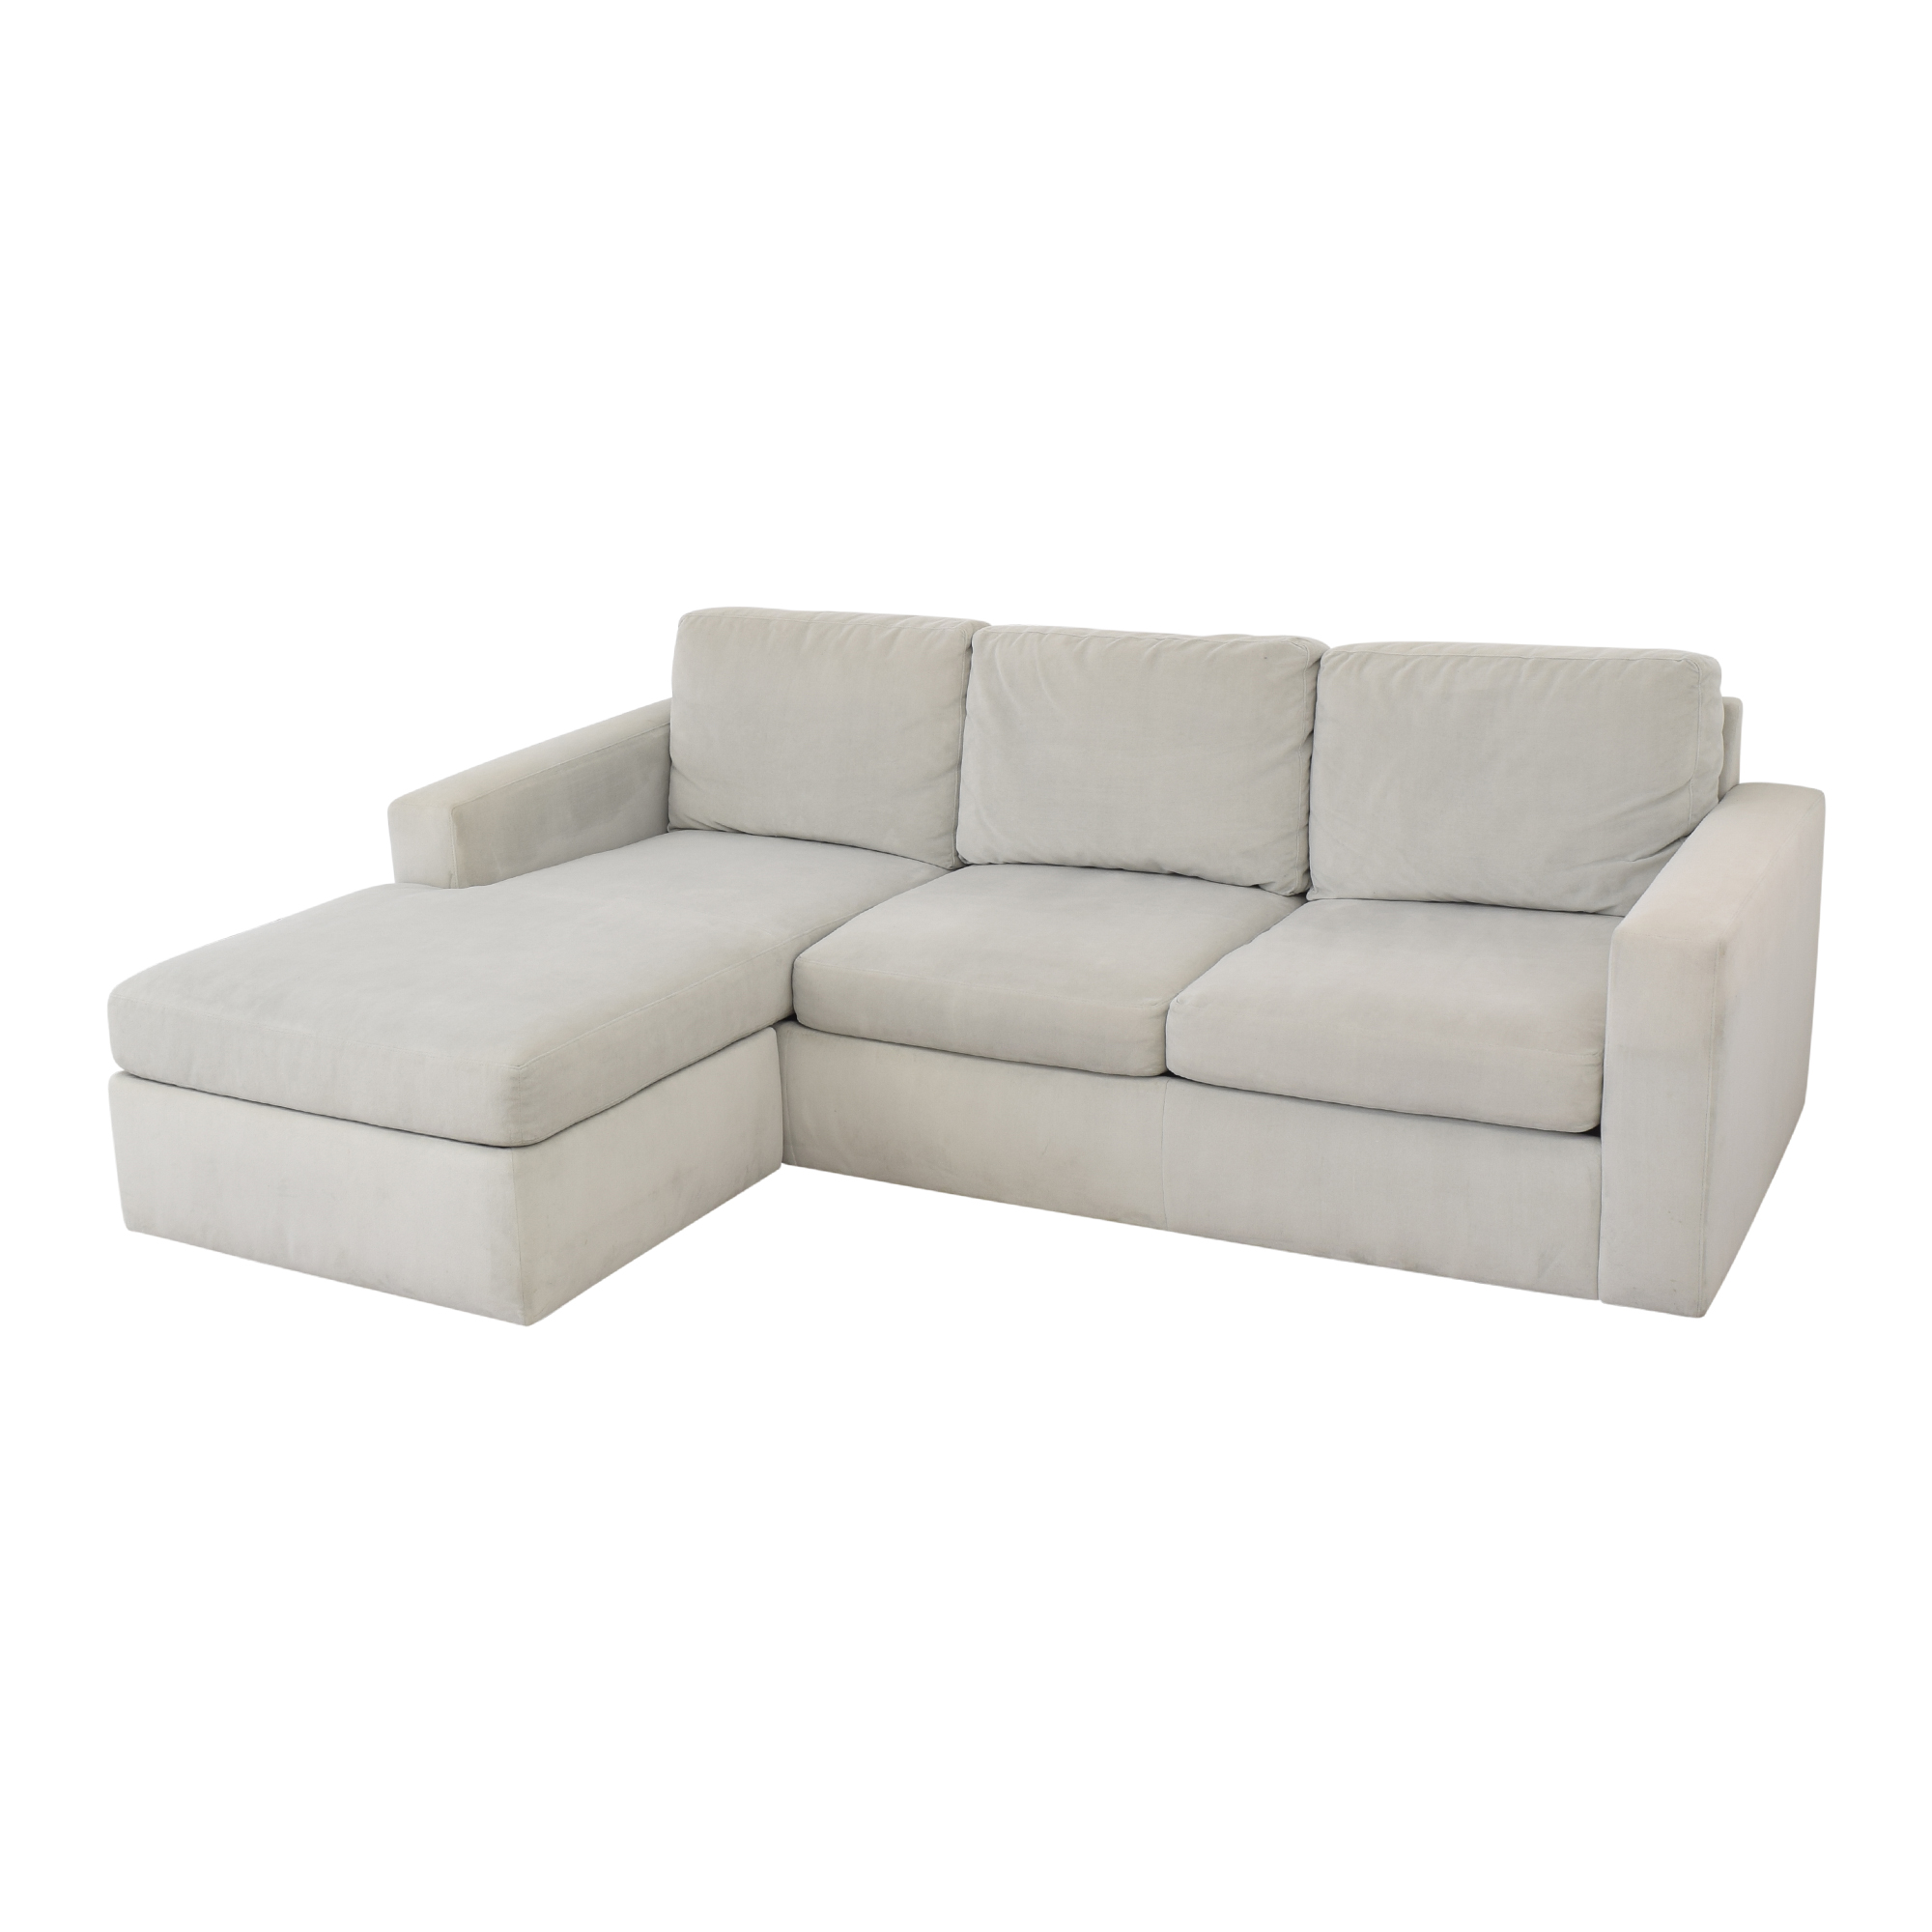 Room & Board Room & Board Taft Sofa with Chaise pa